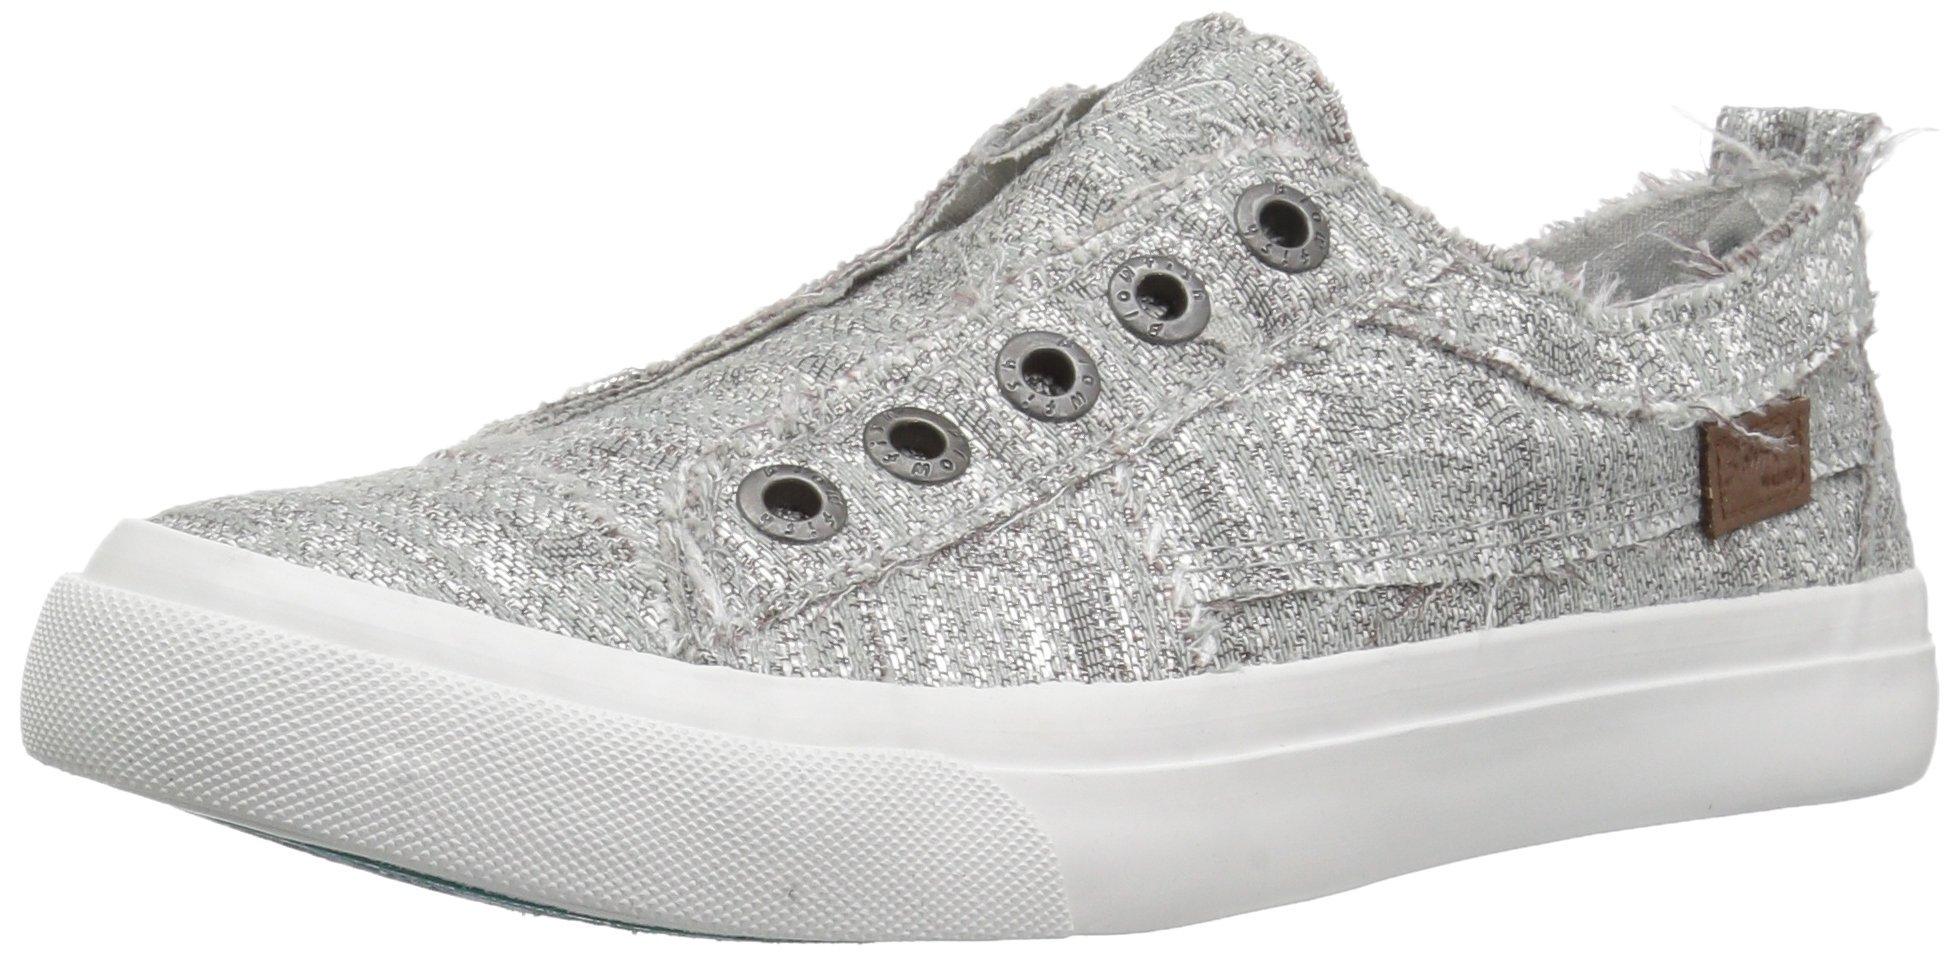 Blowfish Women's Play Sneaker, Silver Glam Weave, 6.5 M US